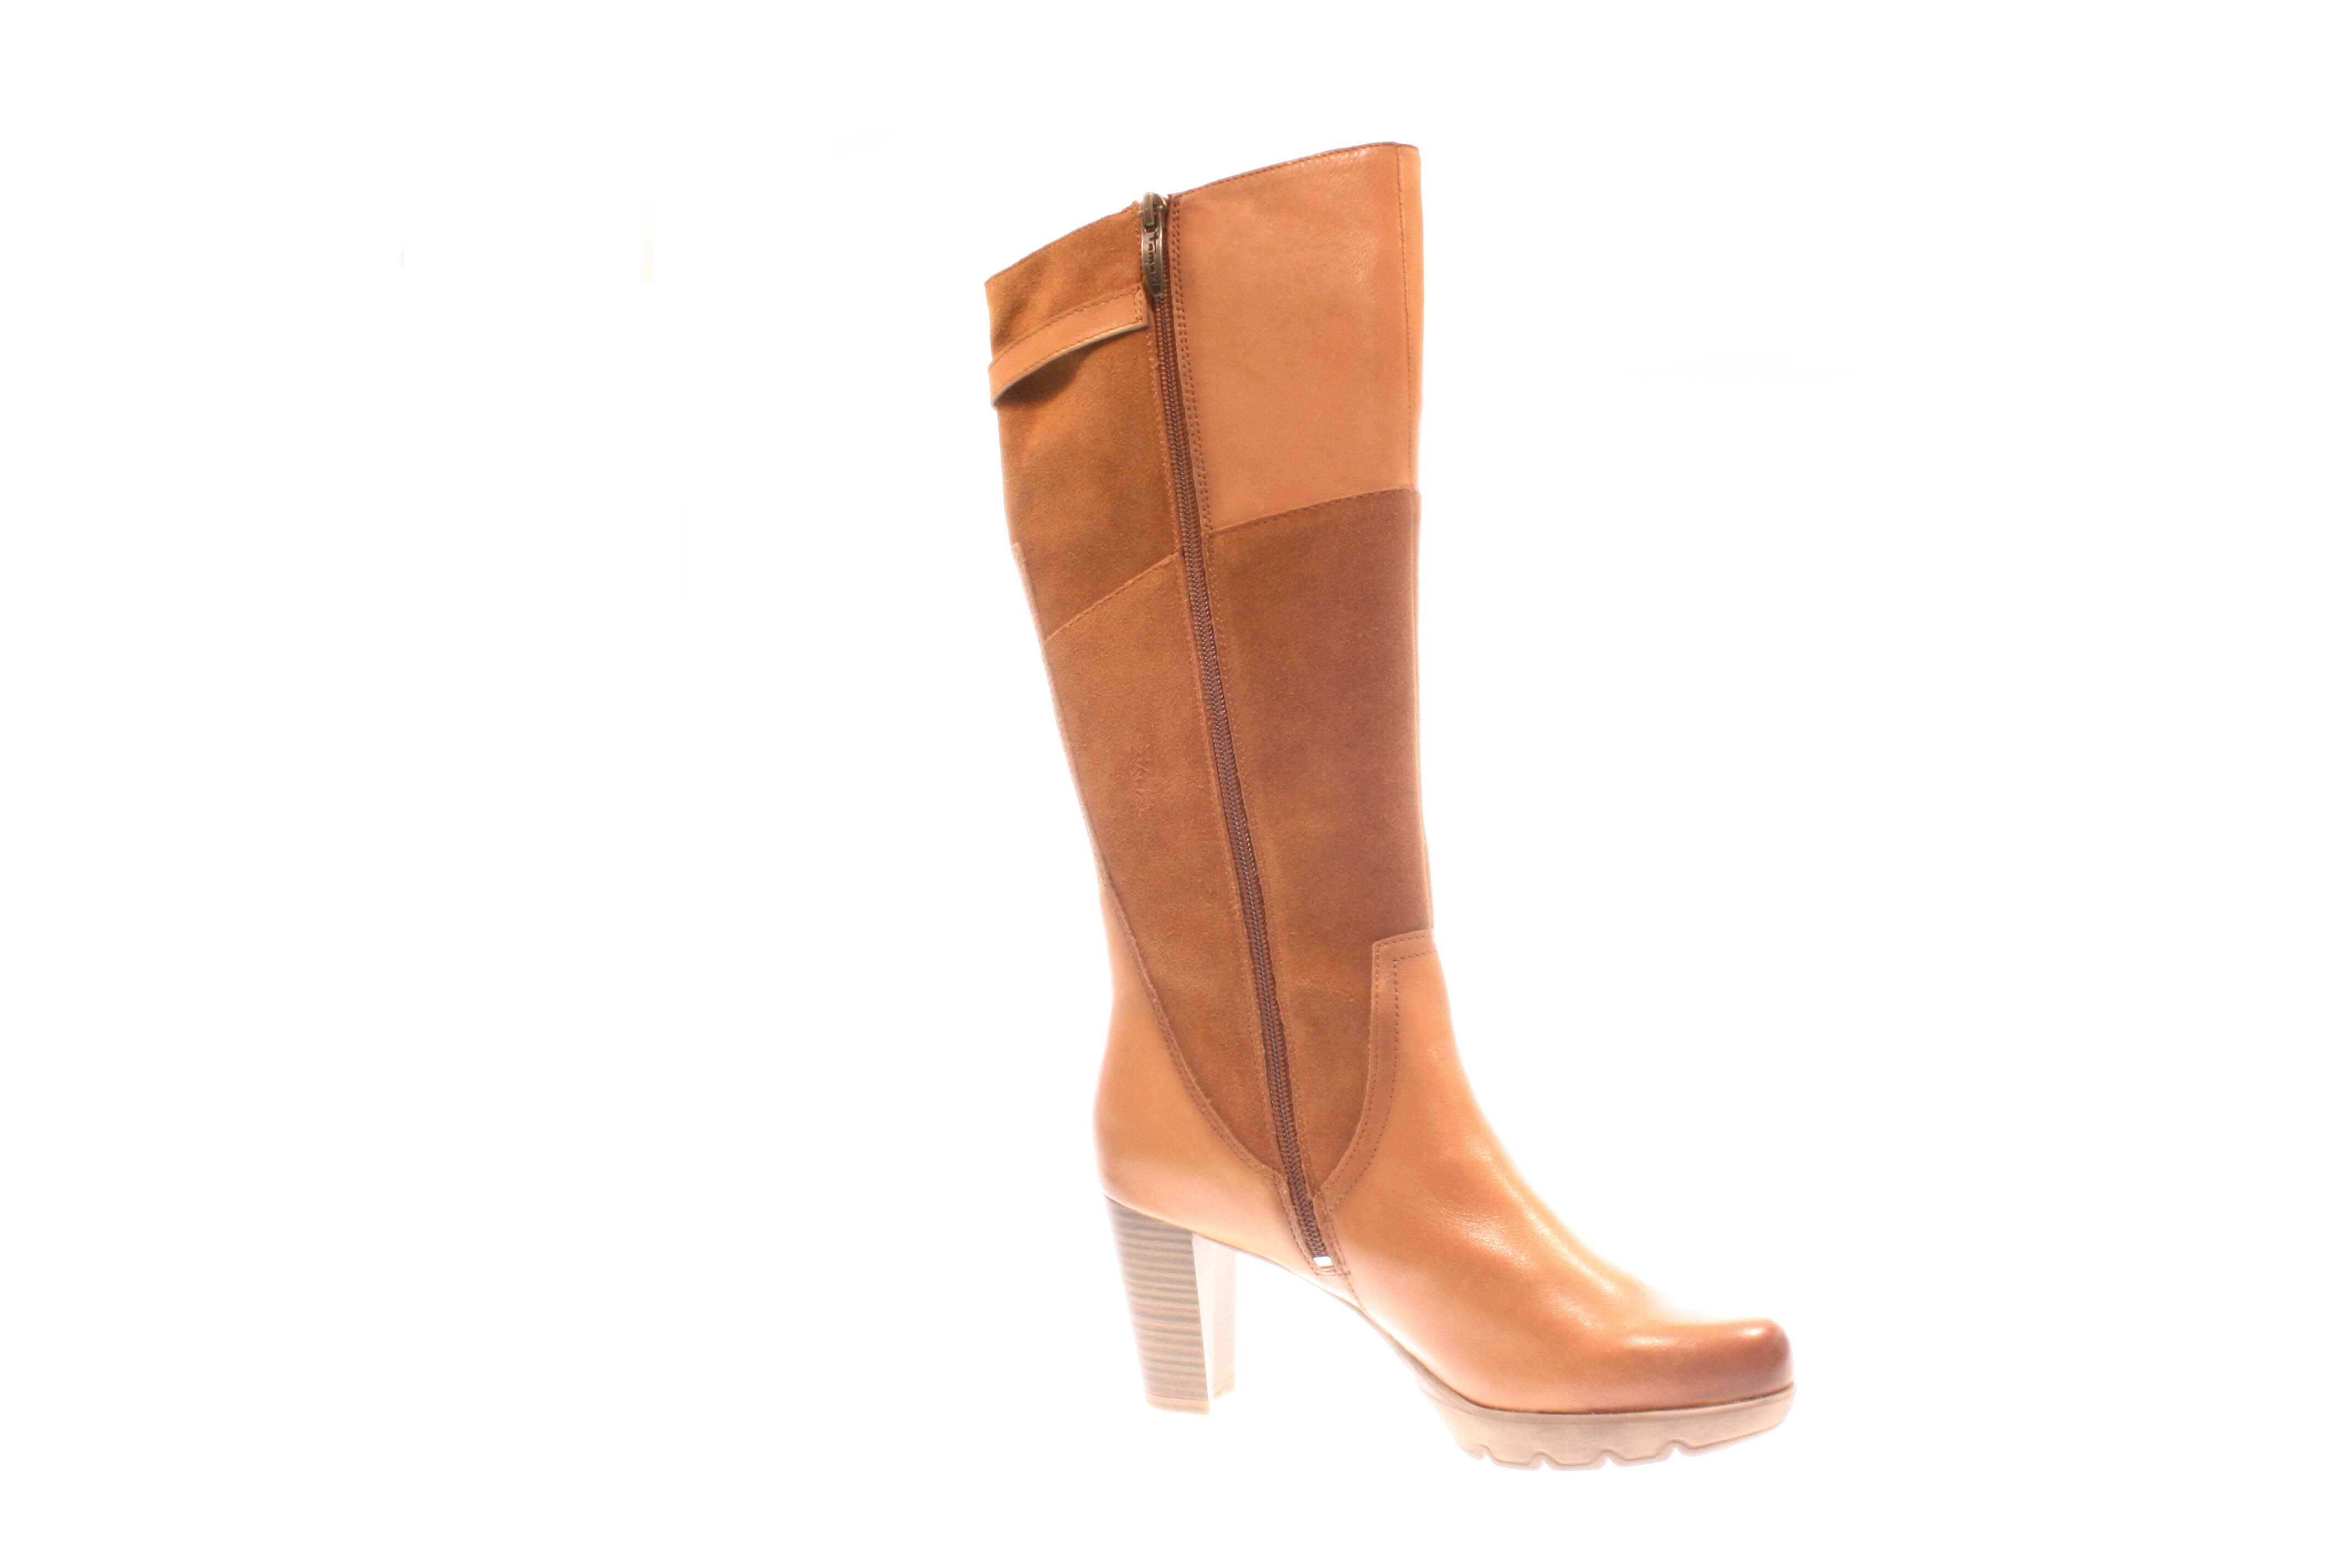 8cddb2c57363c9 Tamaris Damen Stiefel COGNAC COMB (Braun) 1-1-25515-27 392 • Schuhe ...